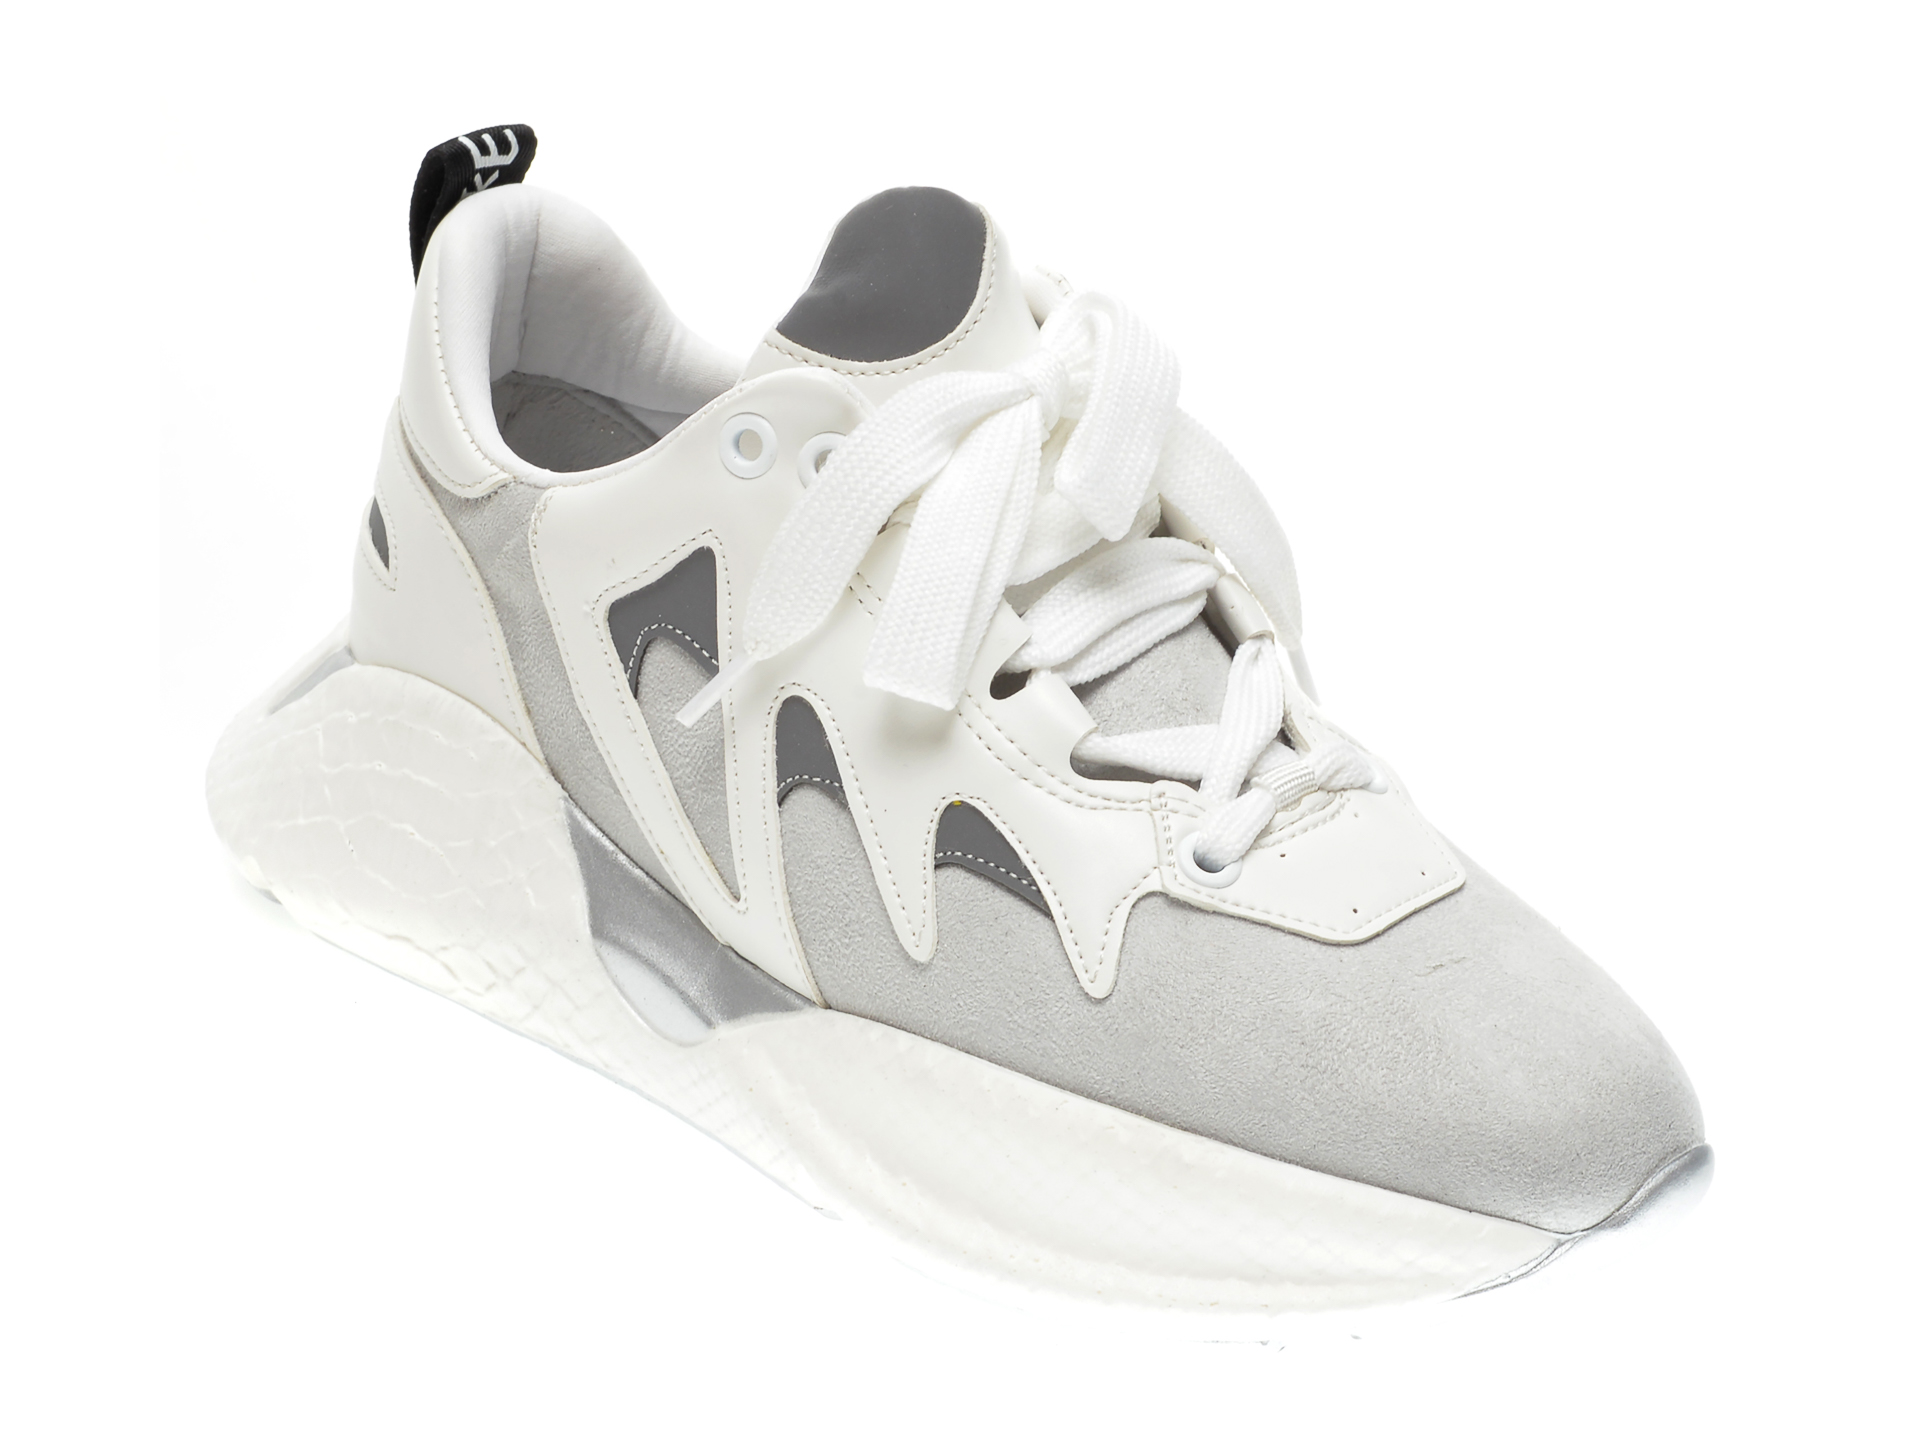 Pantofi sport GRYXX albi, COBRA1, din piele ecologica